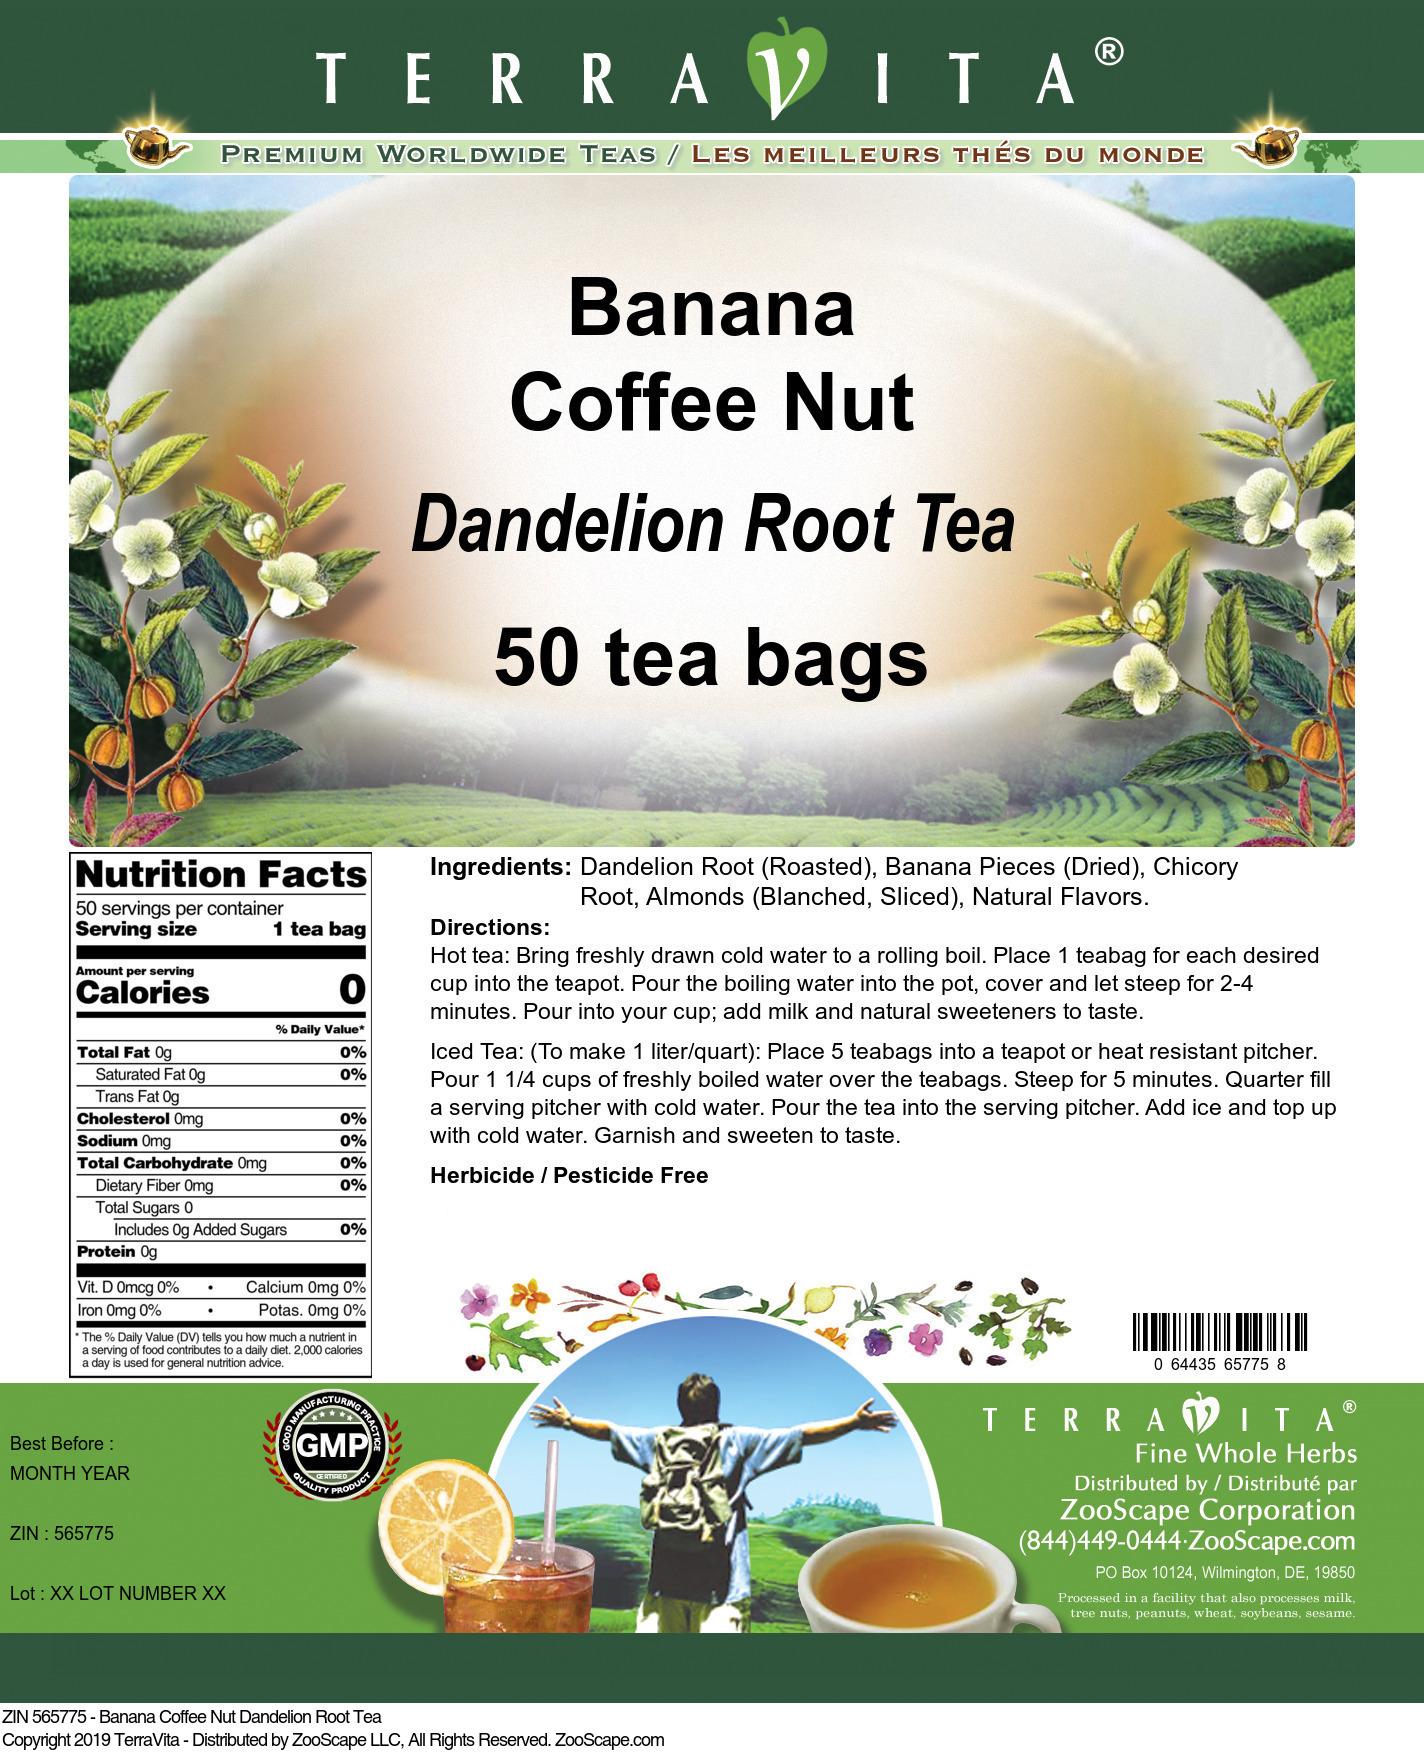 Banana Coffee Nut Dandelion Root